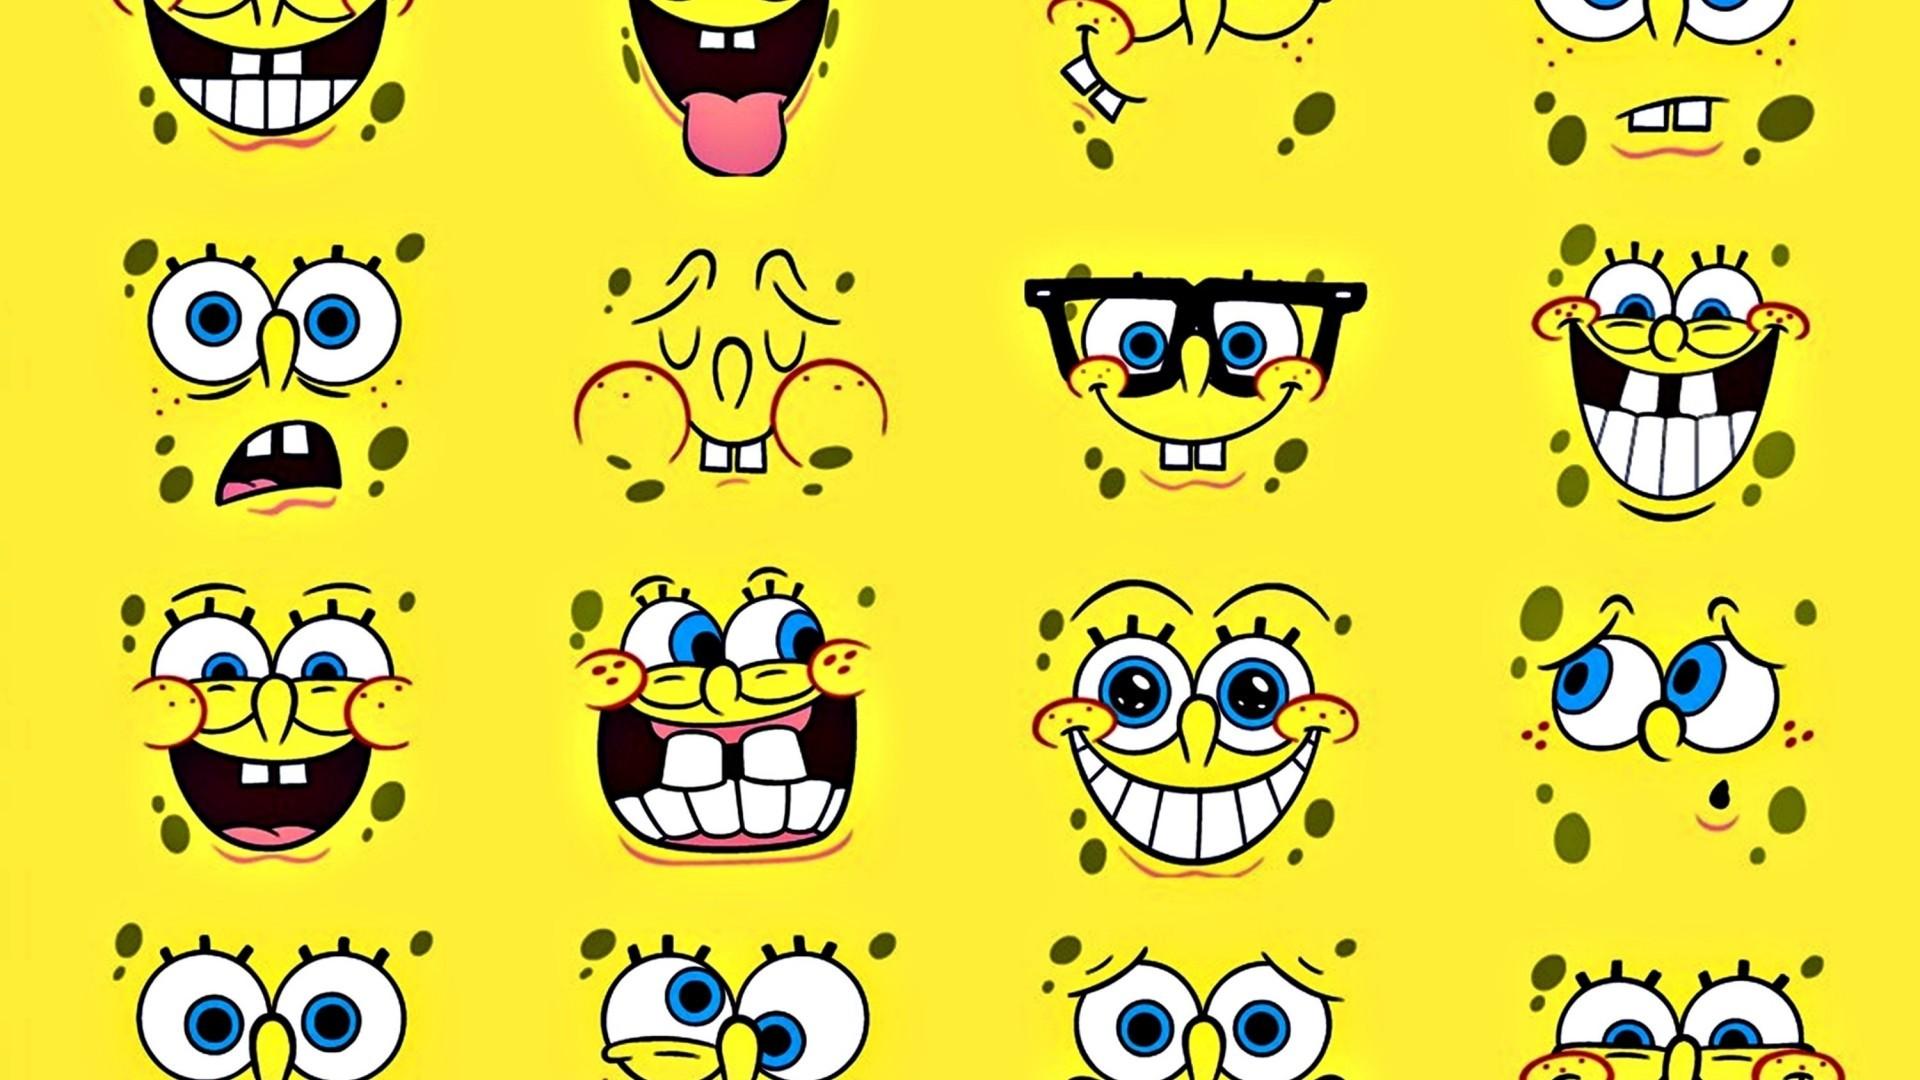 2560x1440 SpongeBob SquarePants pattern wallpaper · Download